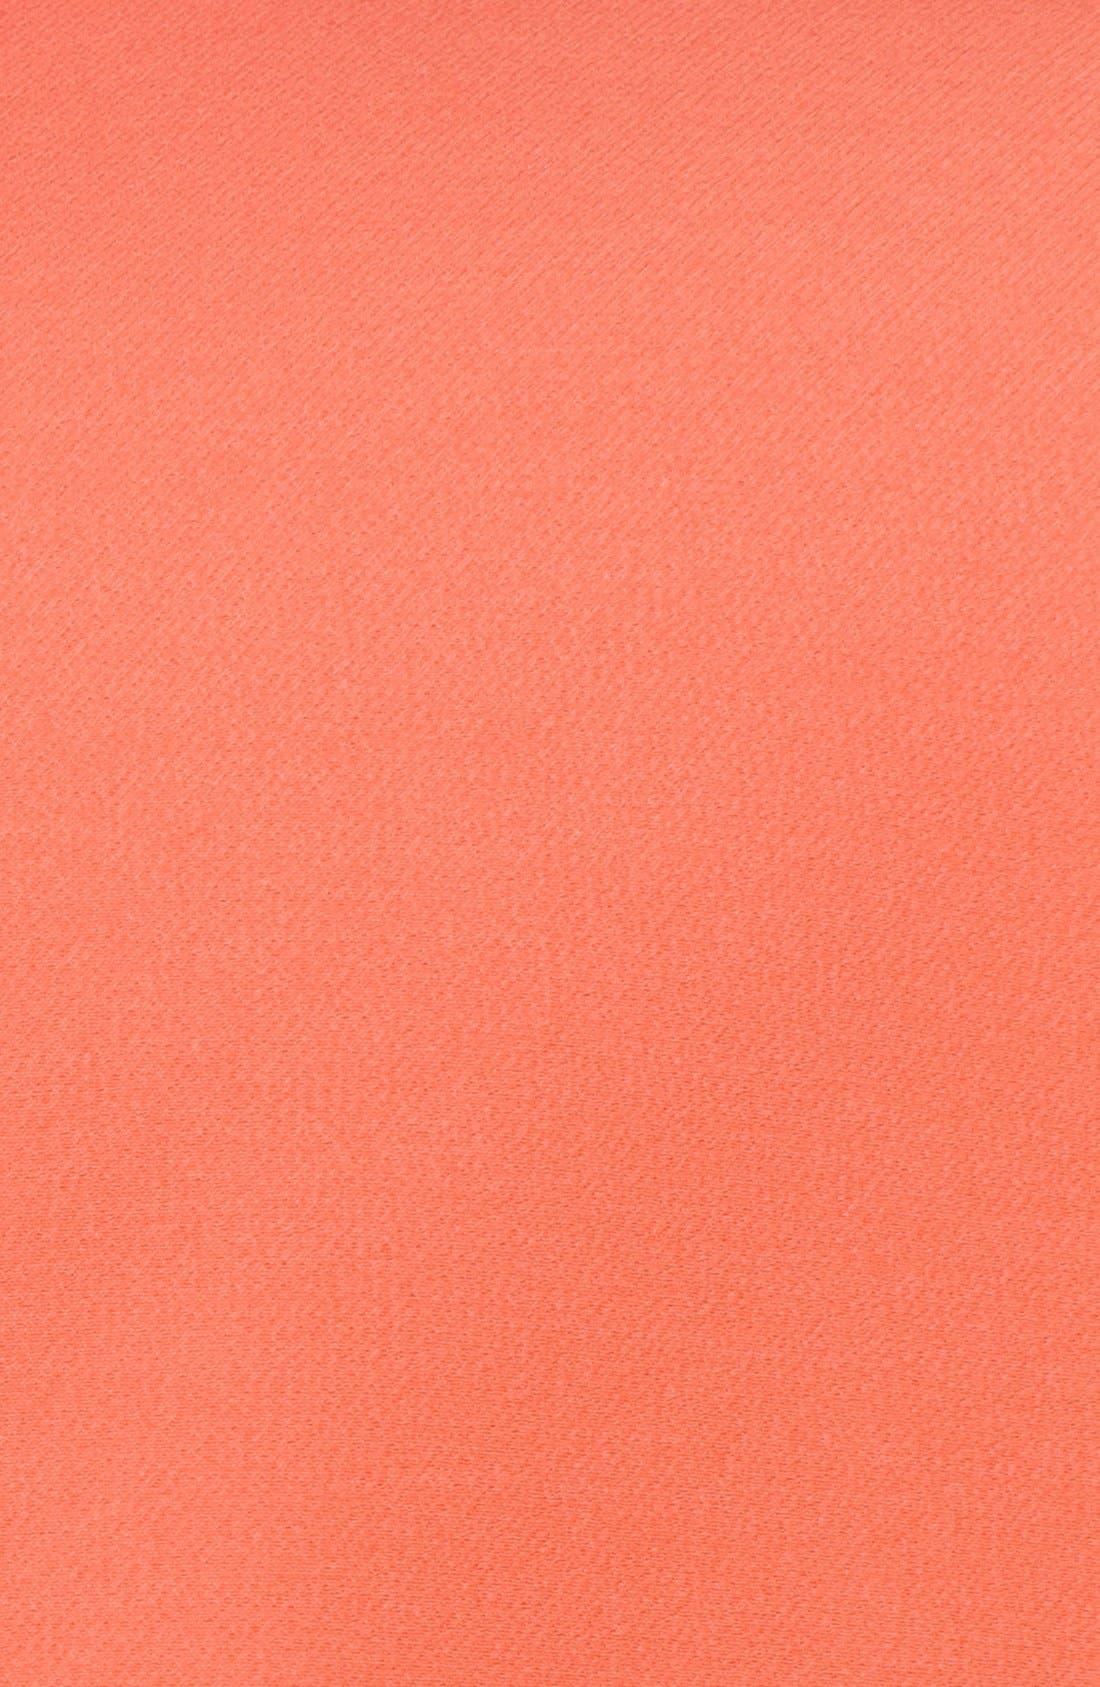 Alternate Image 3  - Stella McCartney 'Simona' Sleeveless V-Neck Dress